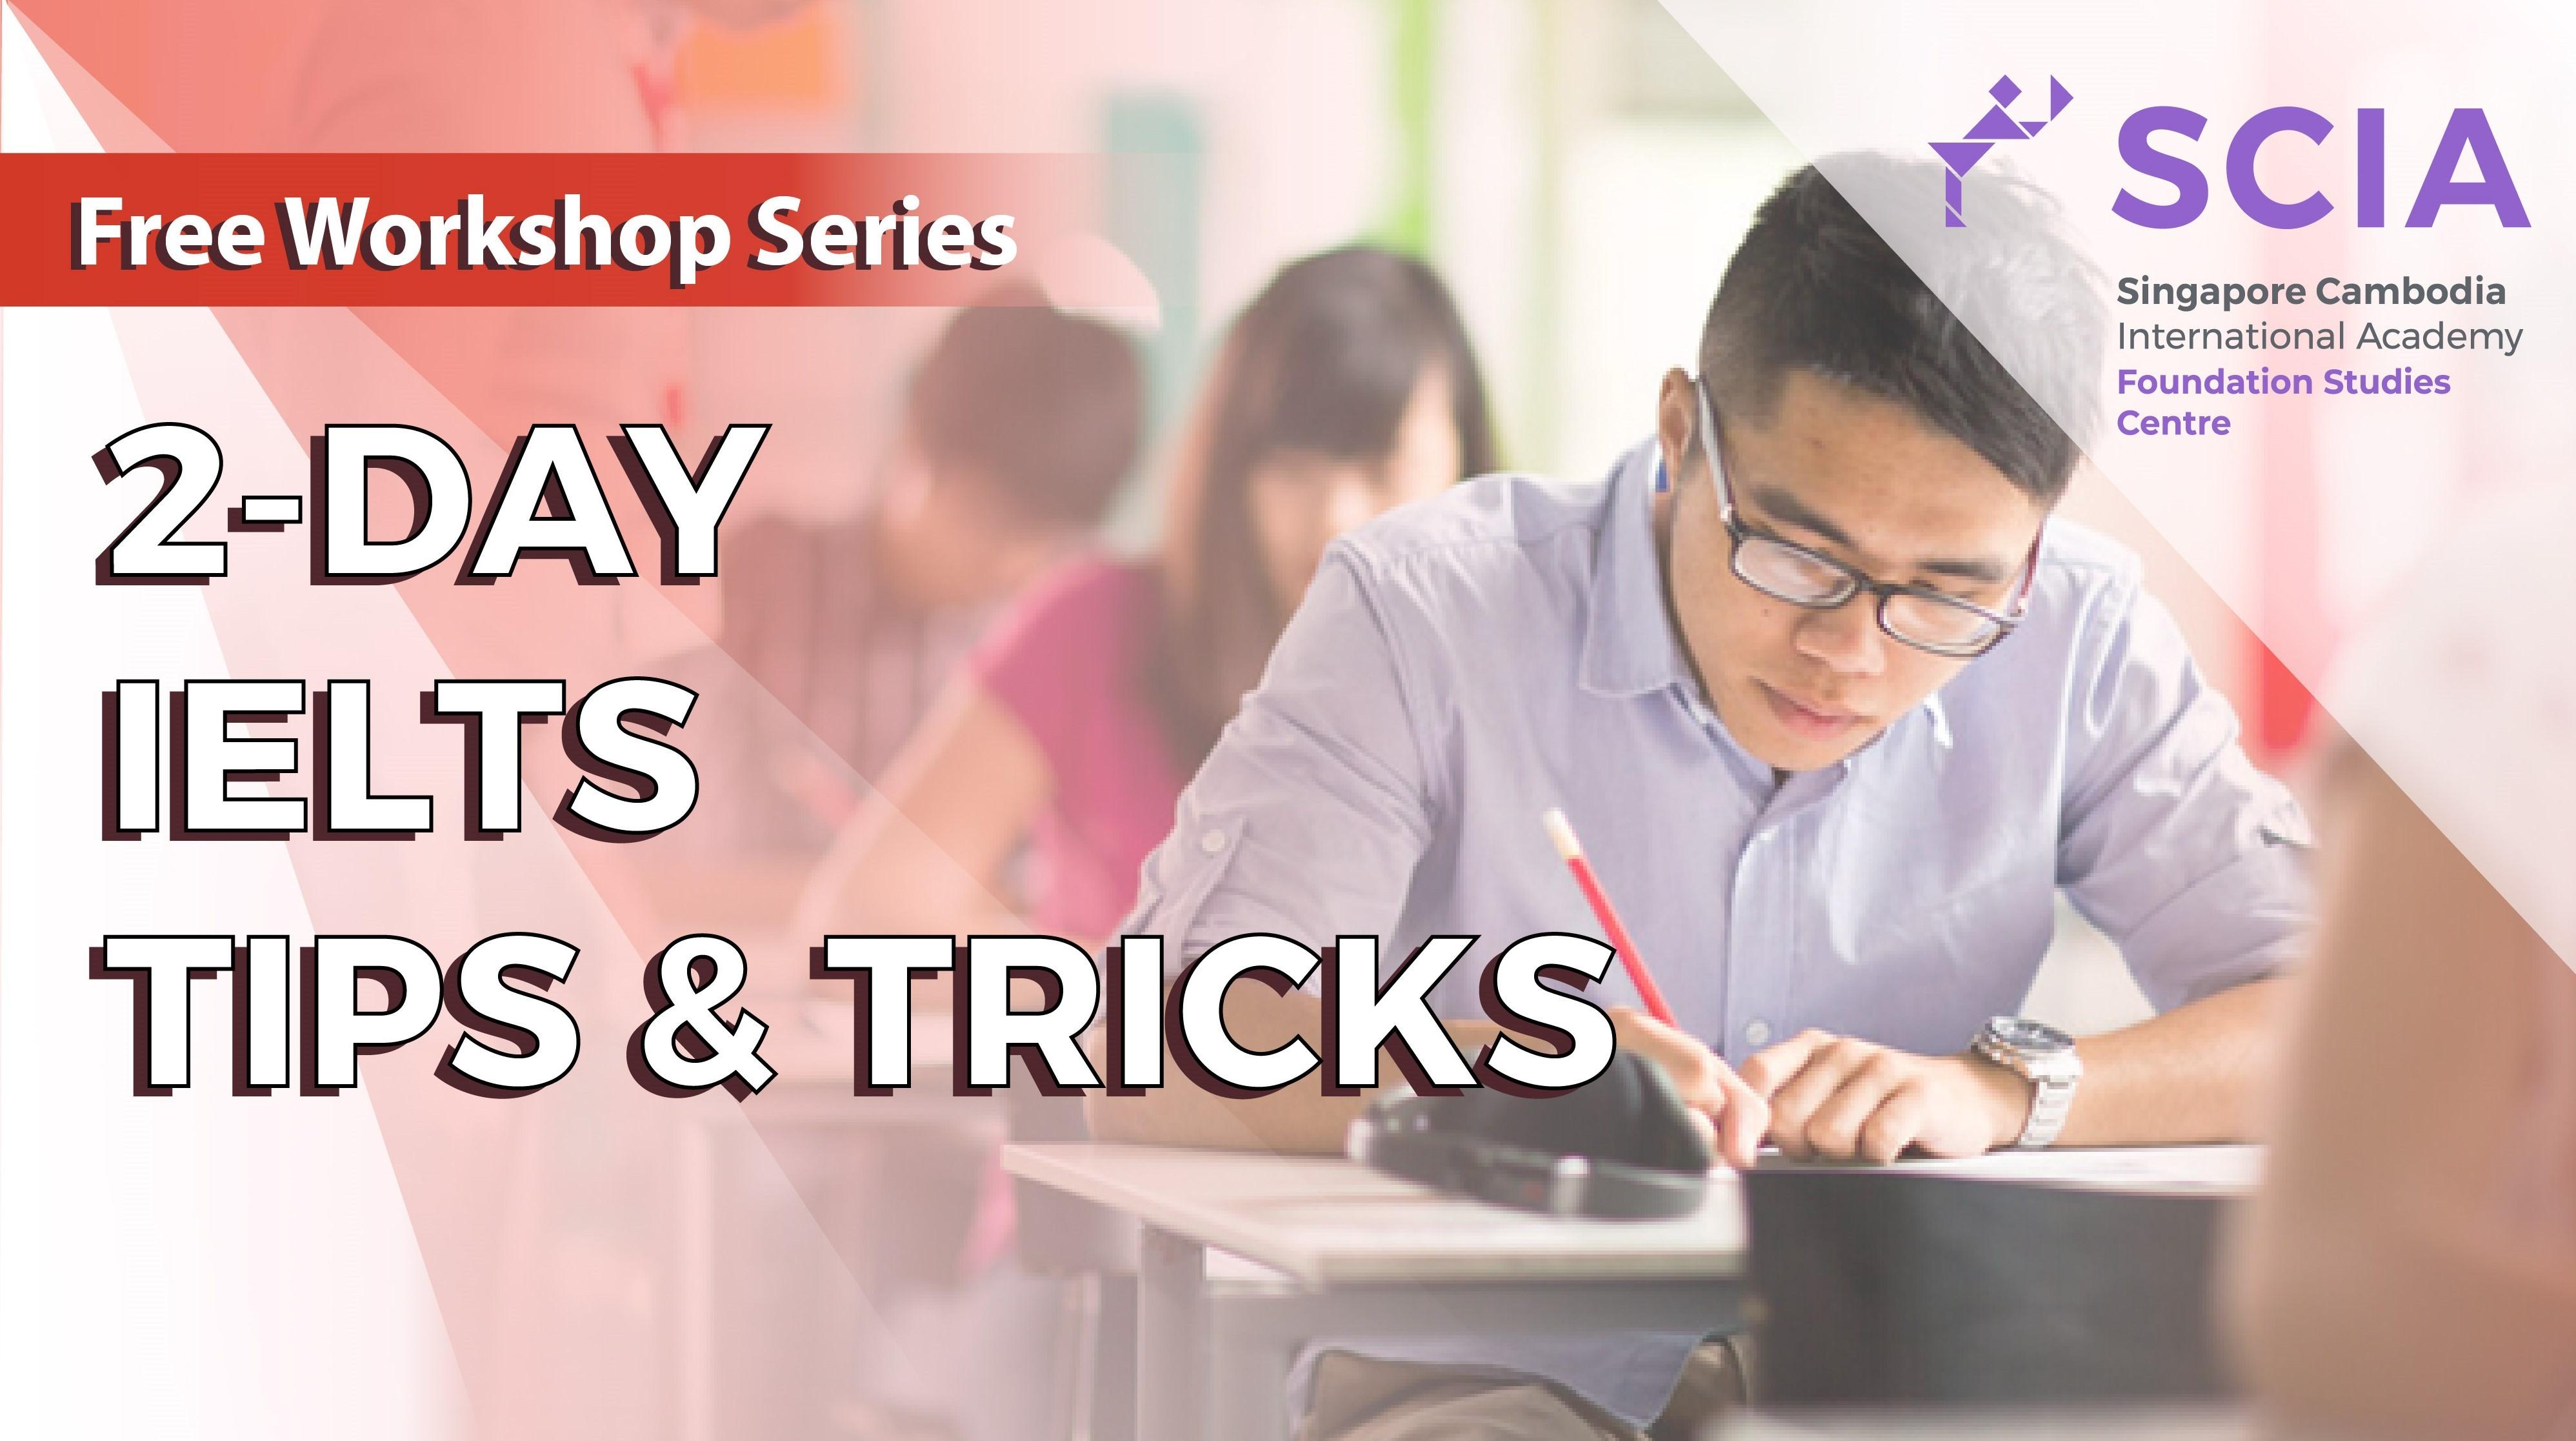 2-Day IELTS Tips & Tricks